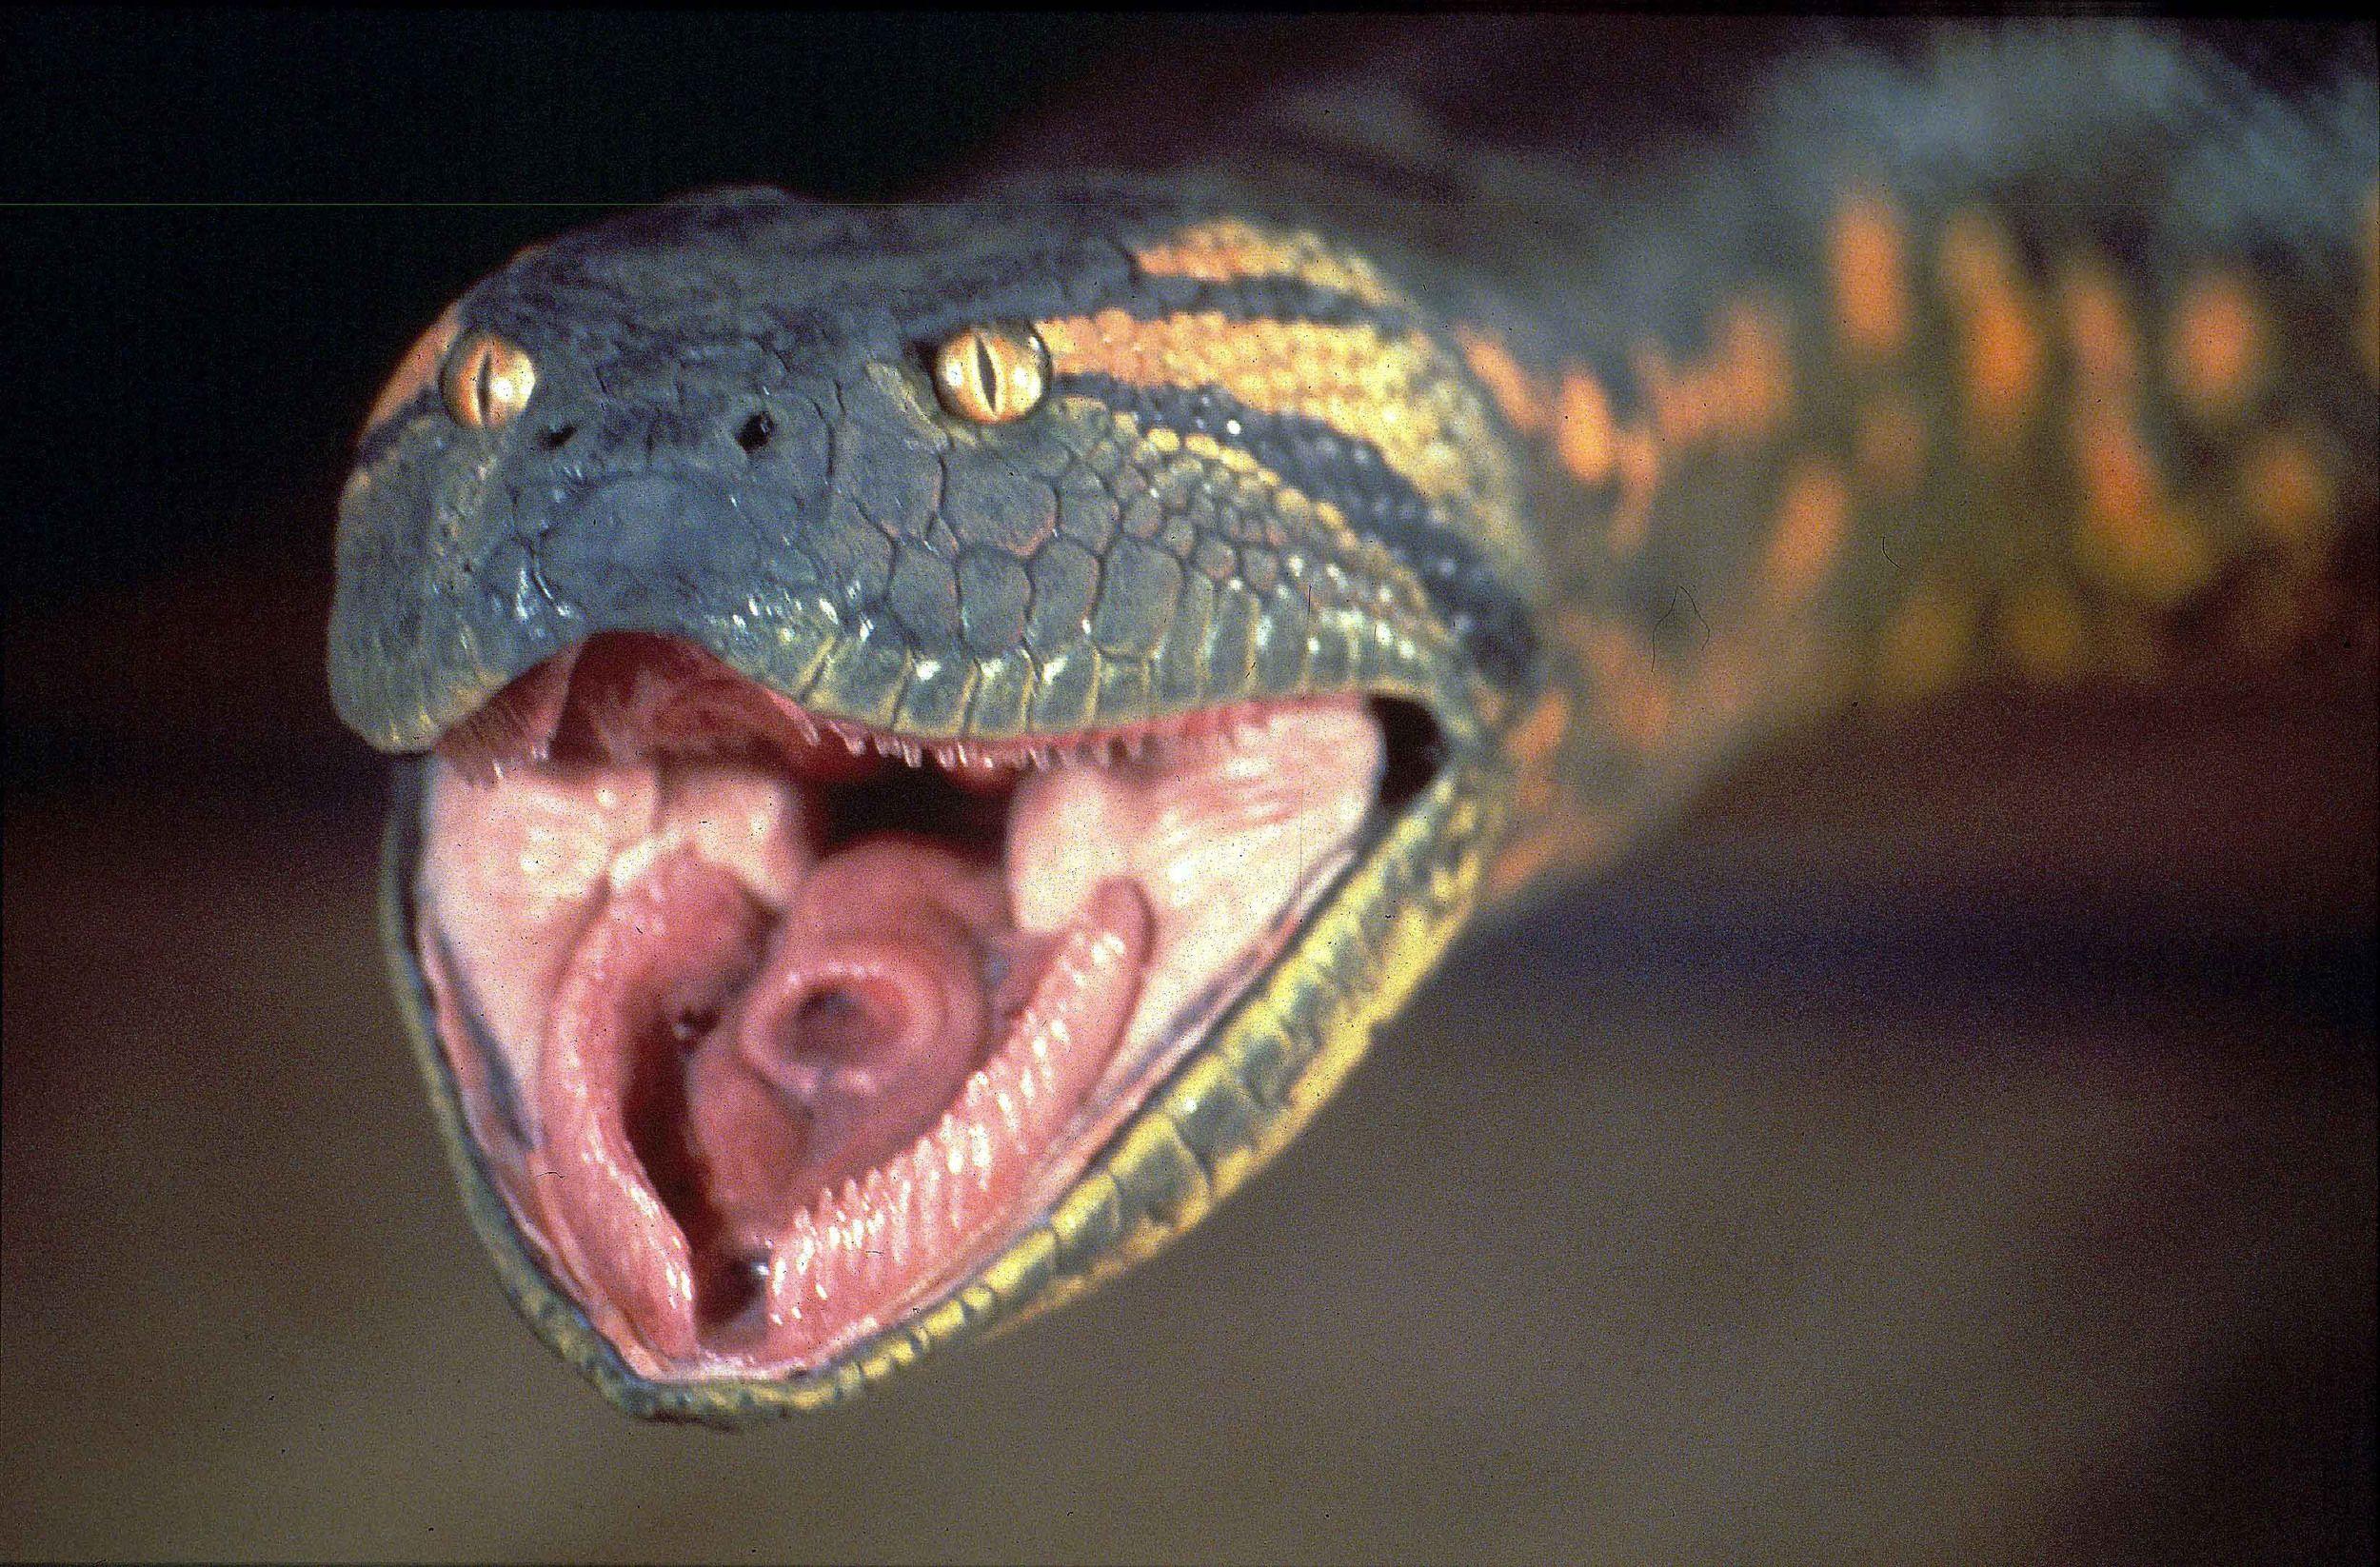 Giant Anaconda